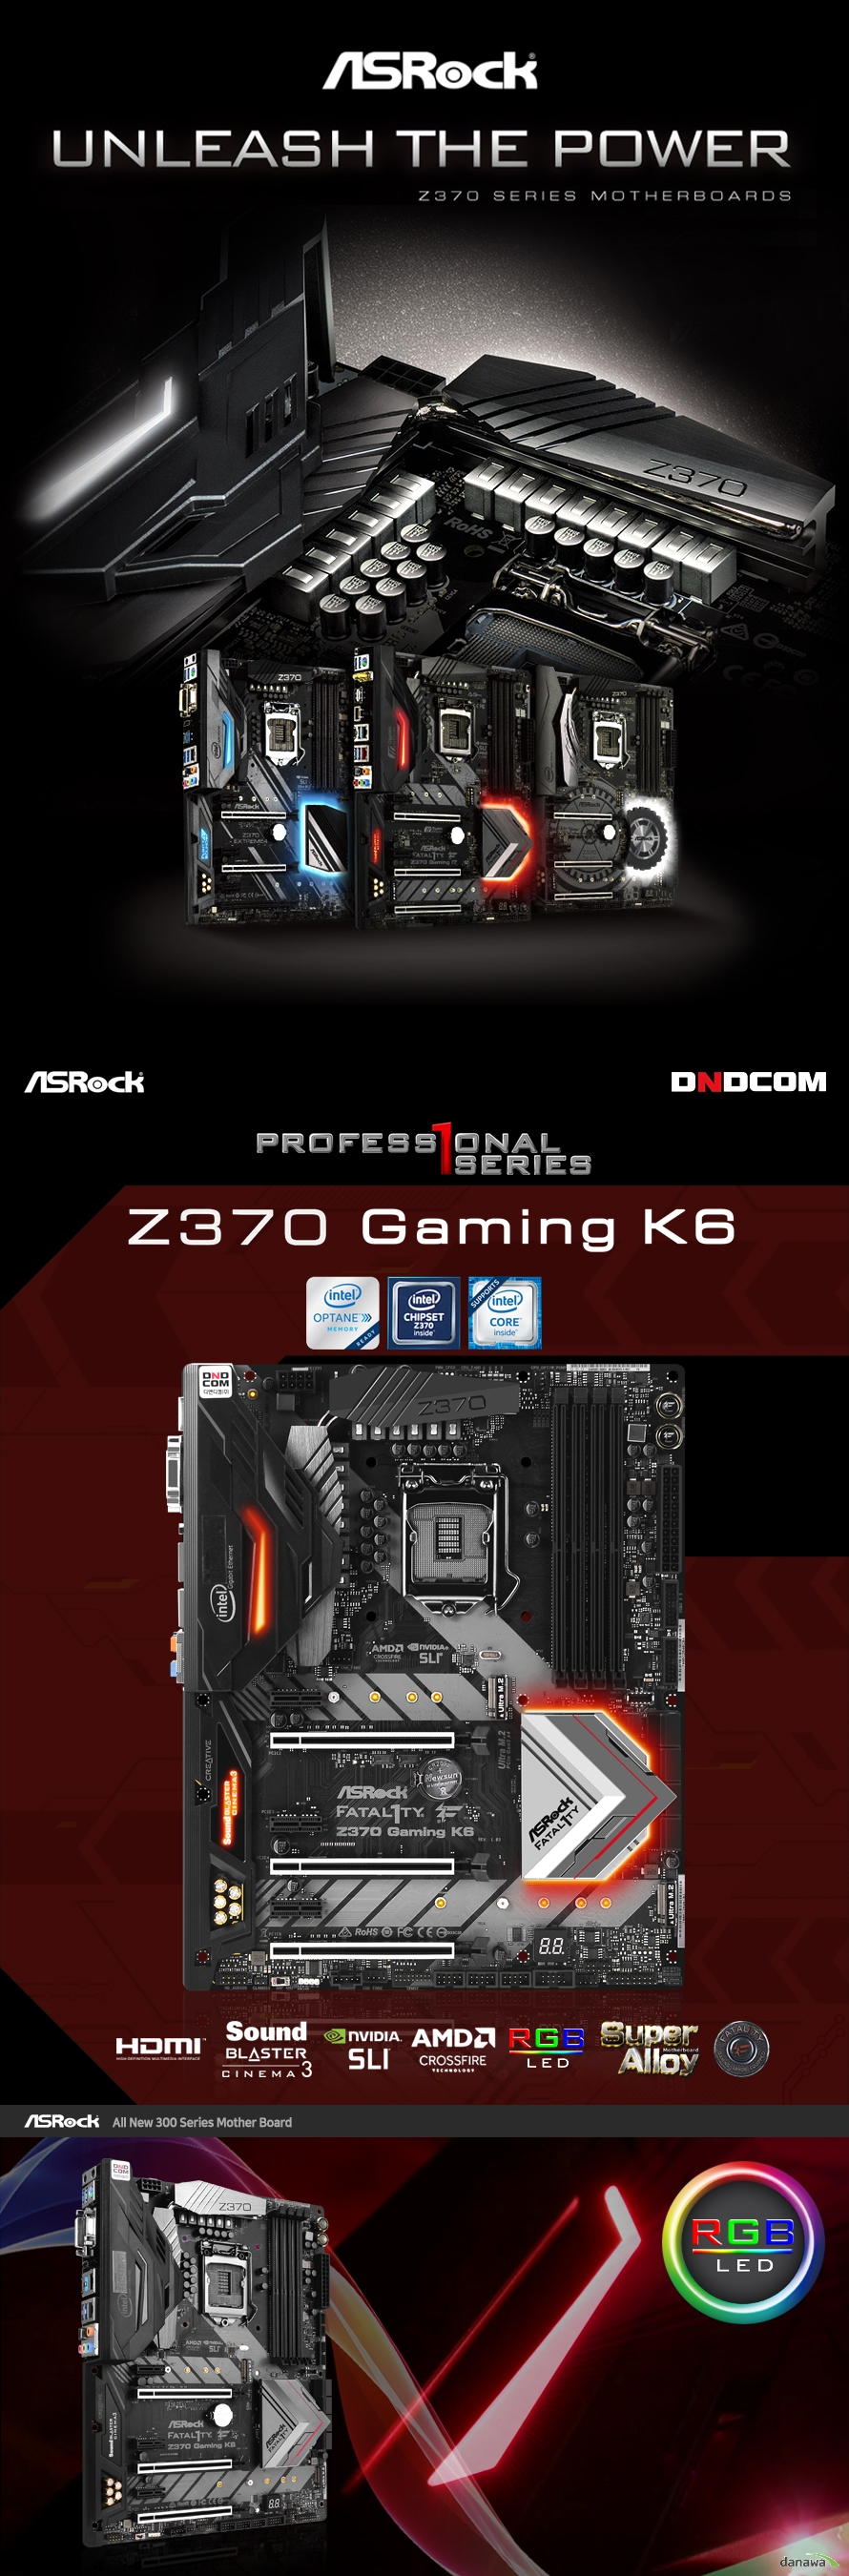 UNLEASH THE POWER ASRock z370 Gaming k6 디앤디컴